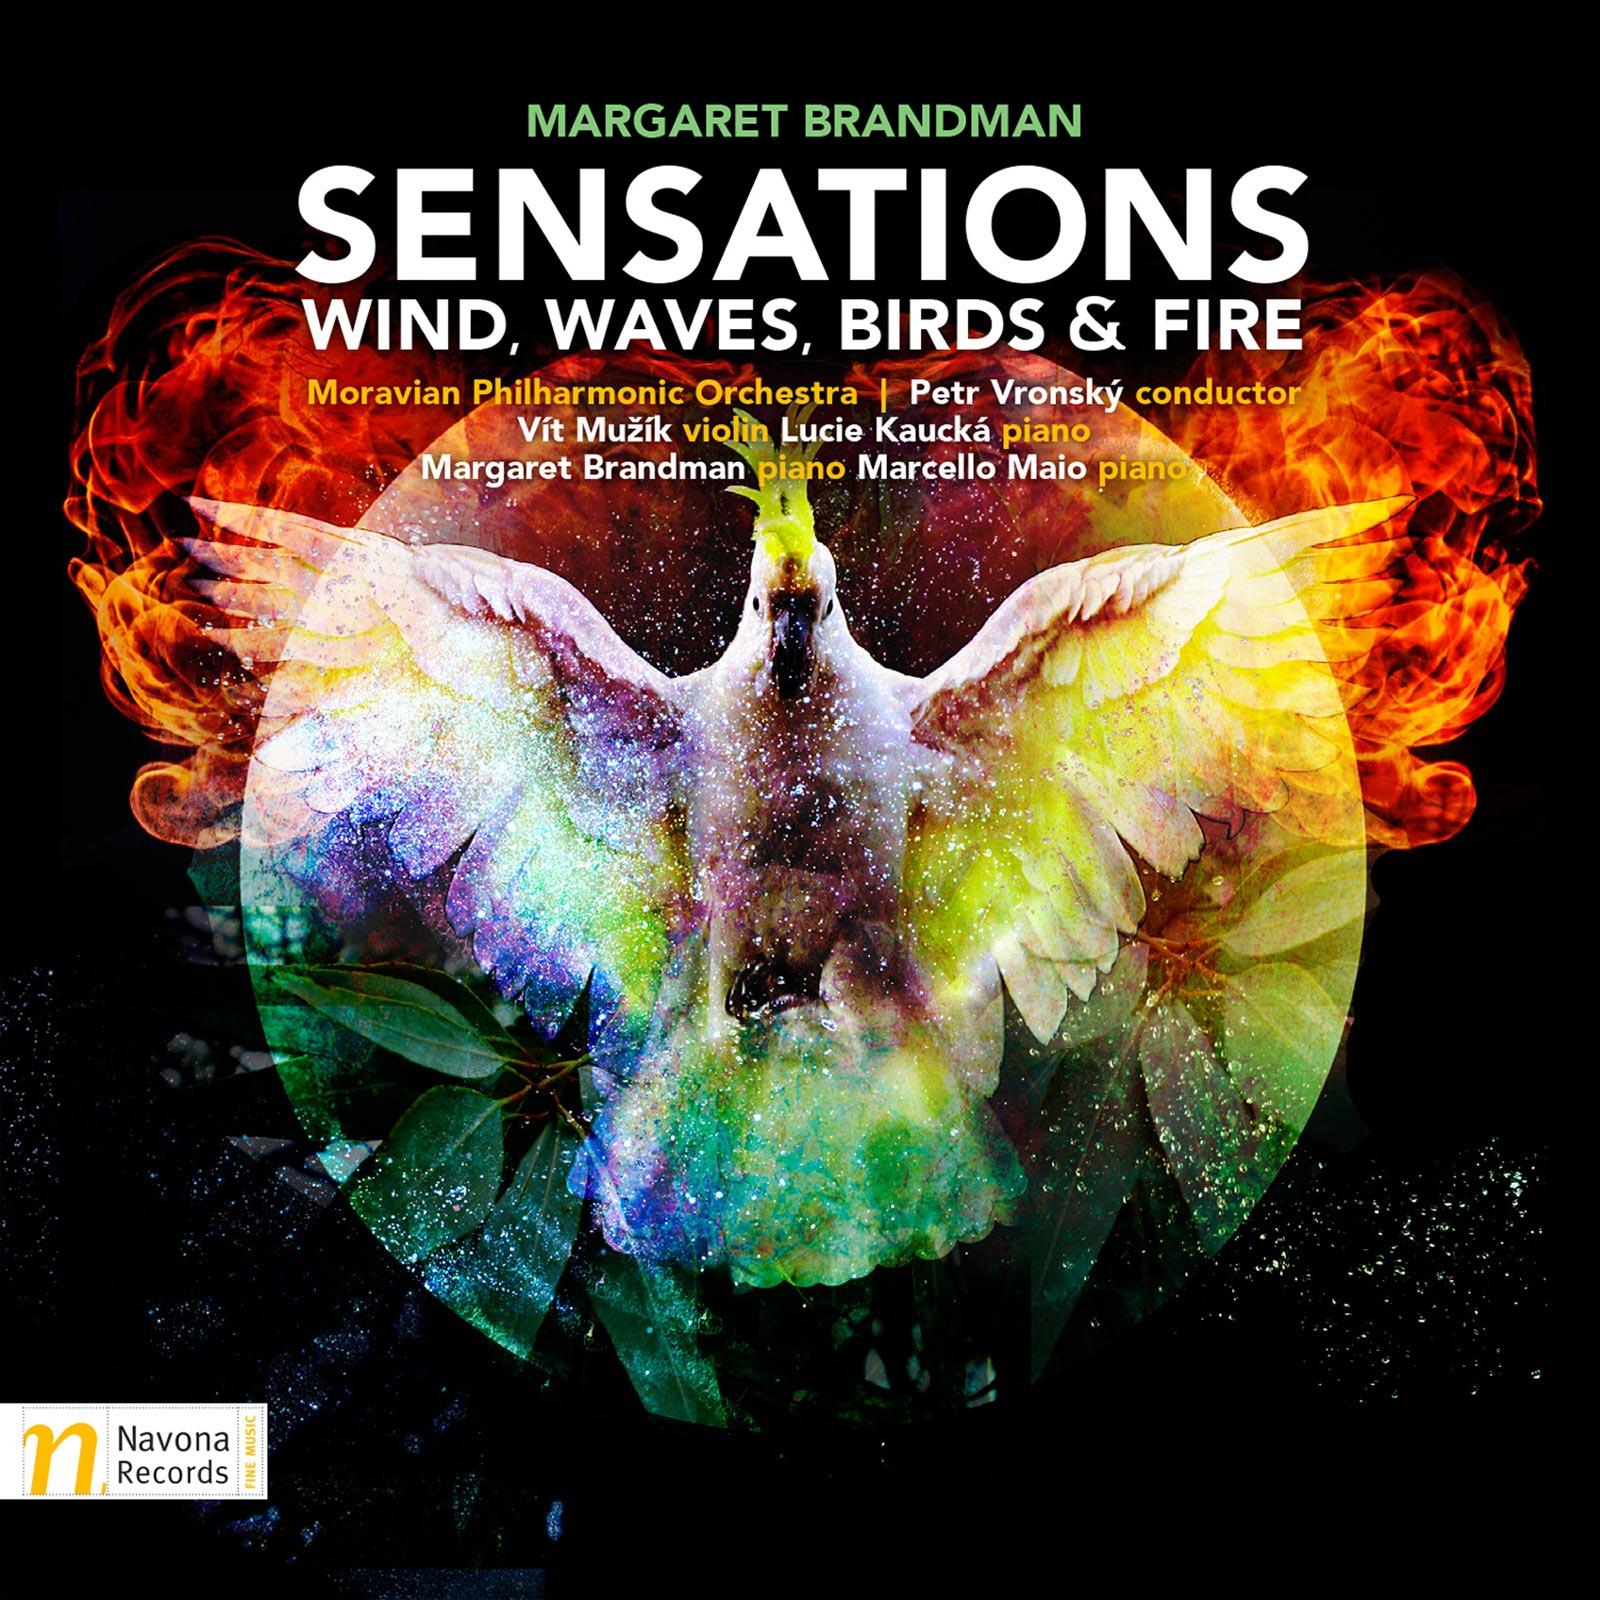 Sensations – Wind, Waves, Birds & Fire